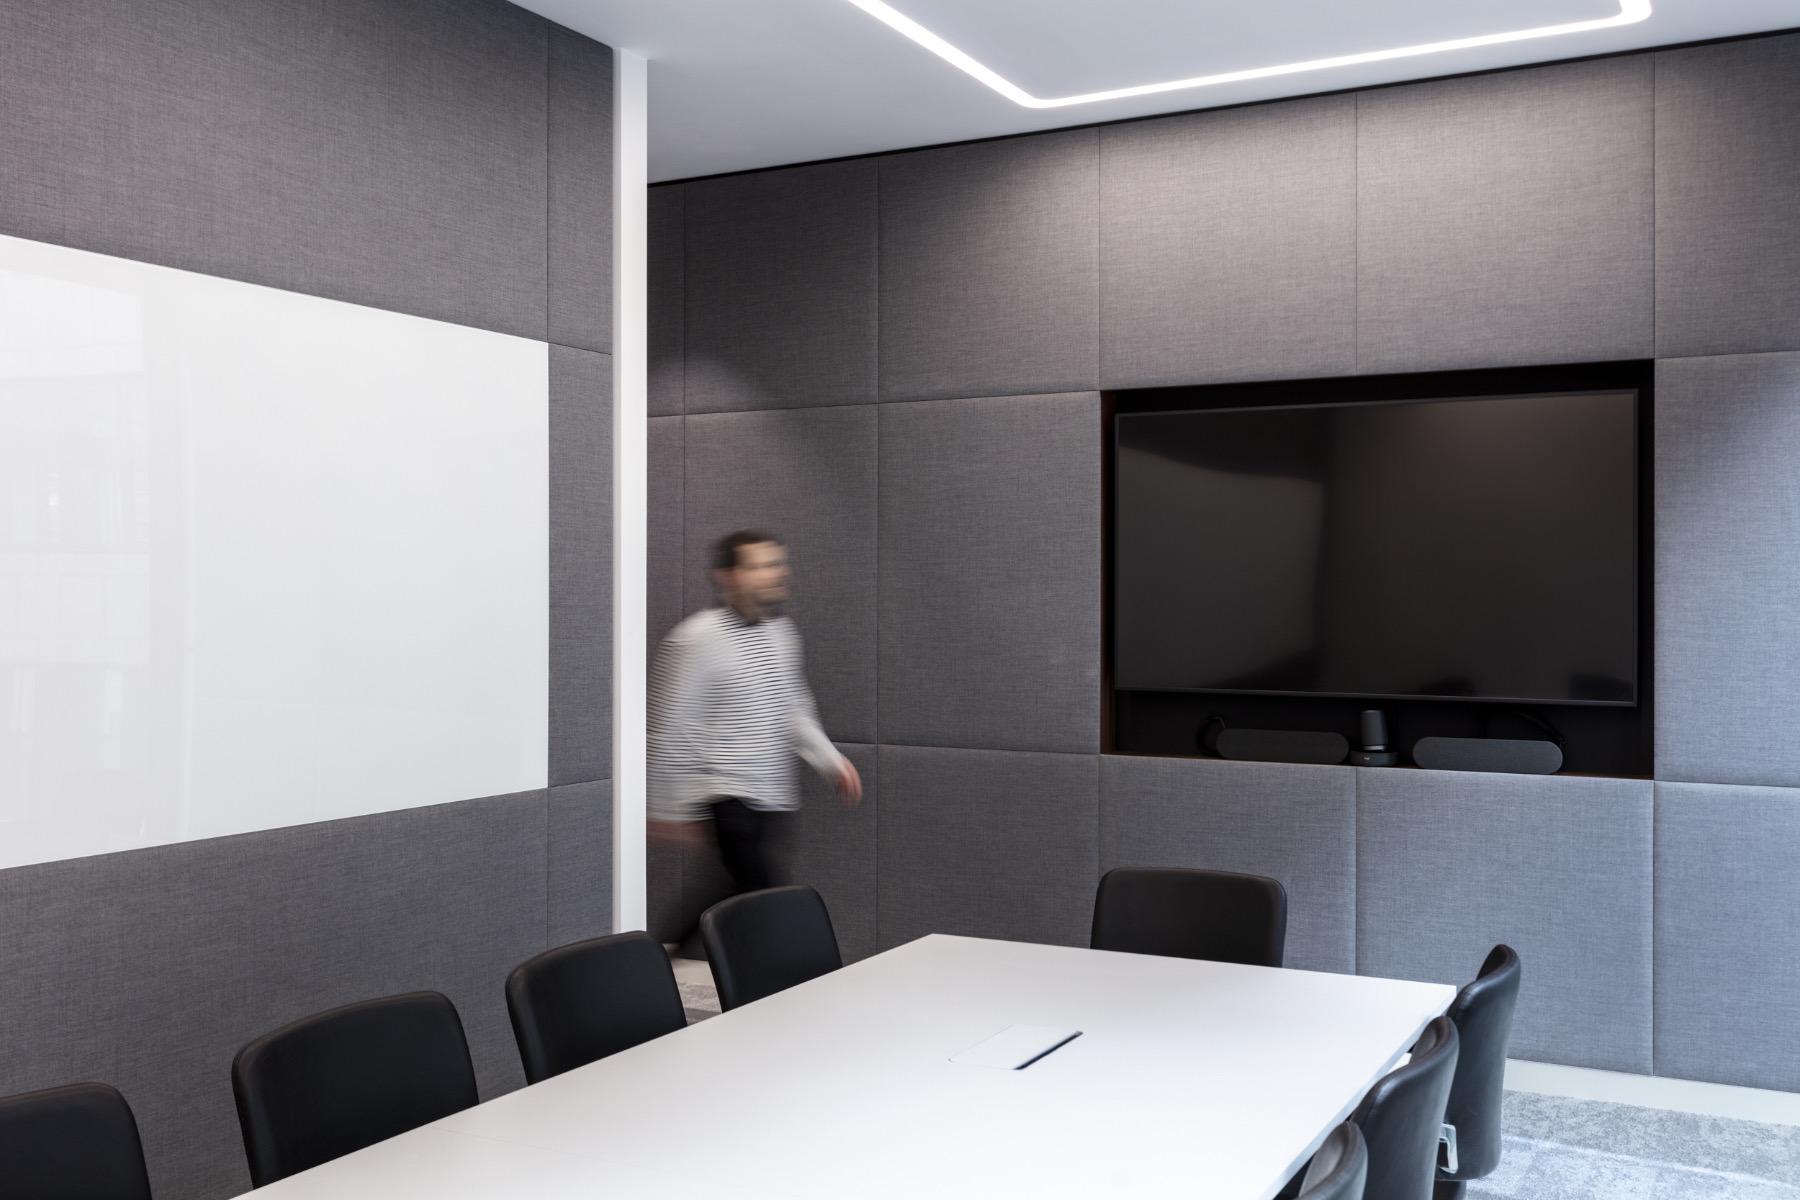 A Look Inside Amundi's New London Office